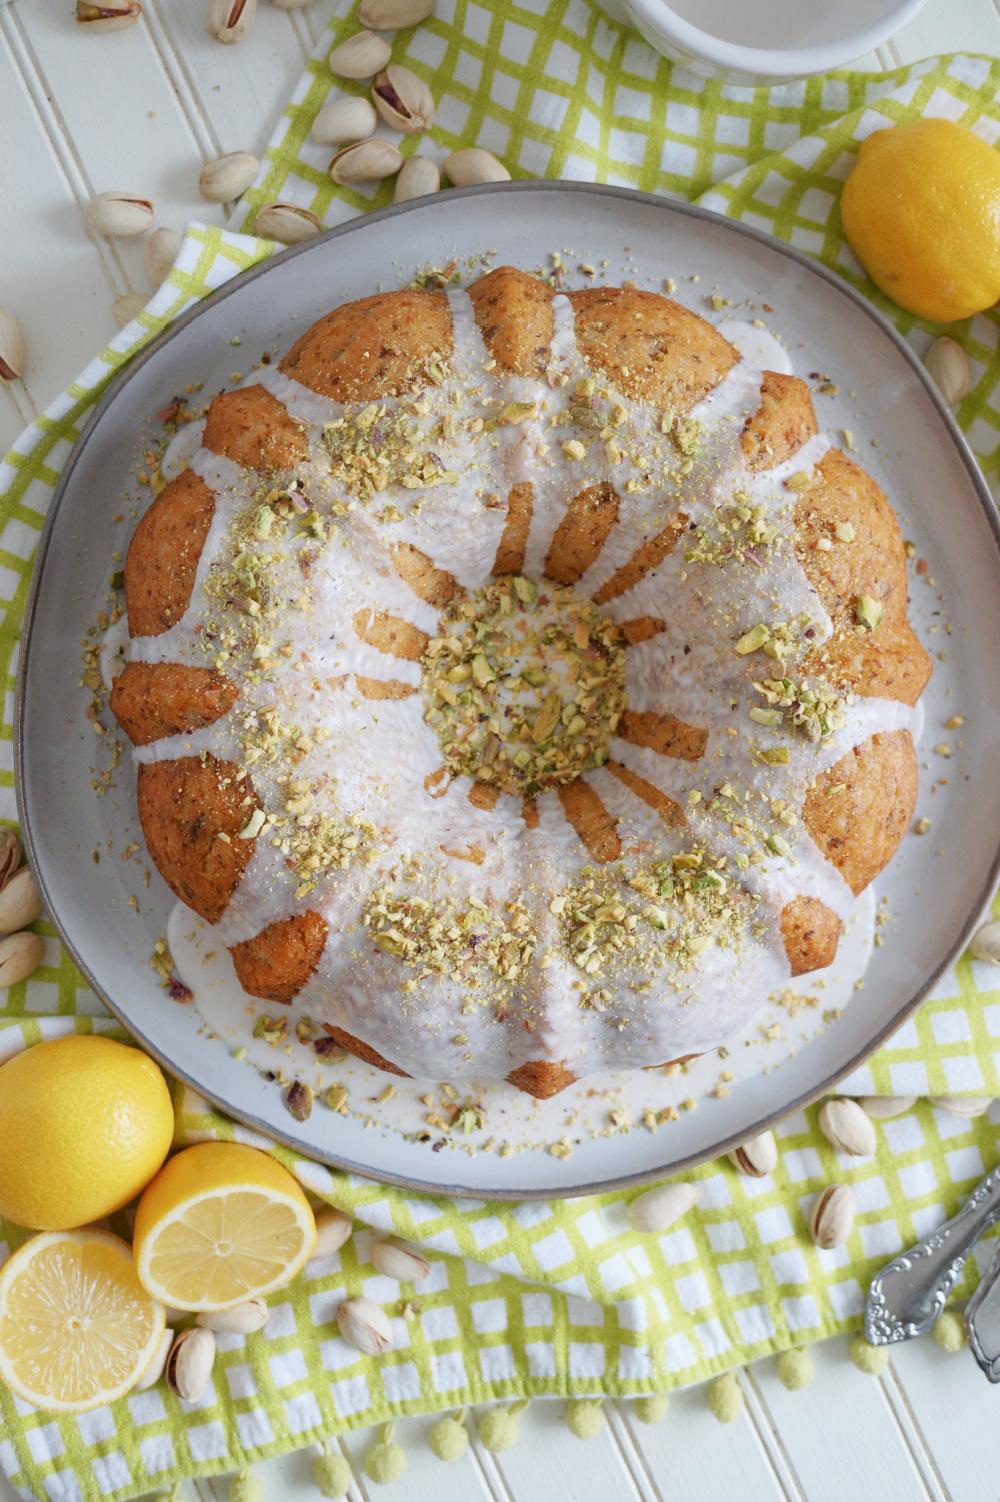 overhead photo of lemon pistachio bundt cake with glaze and pistachios on top